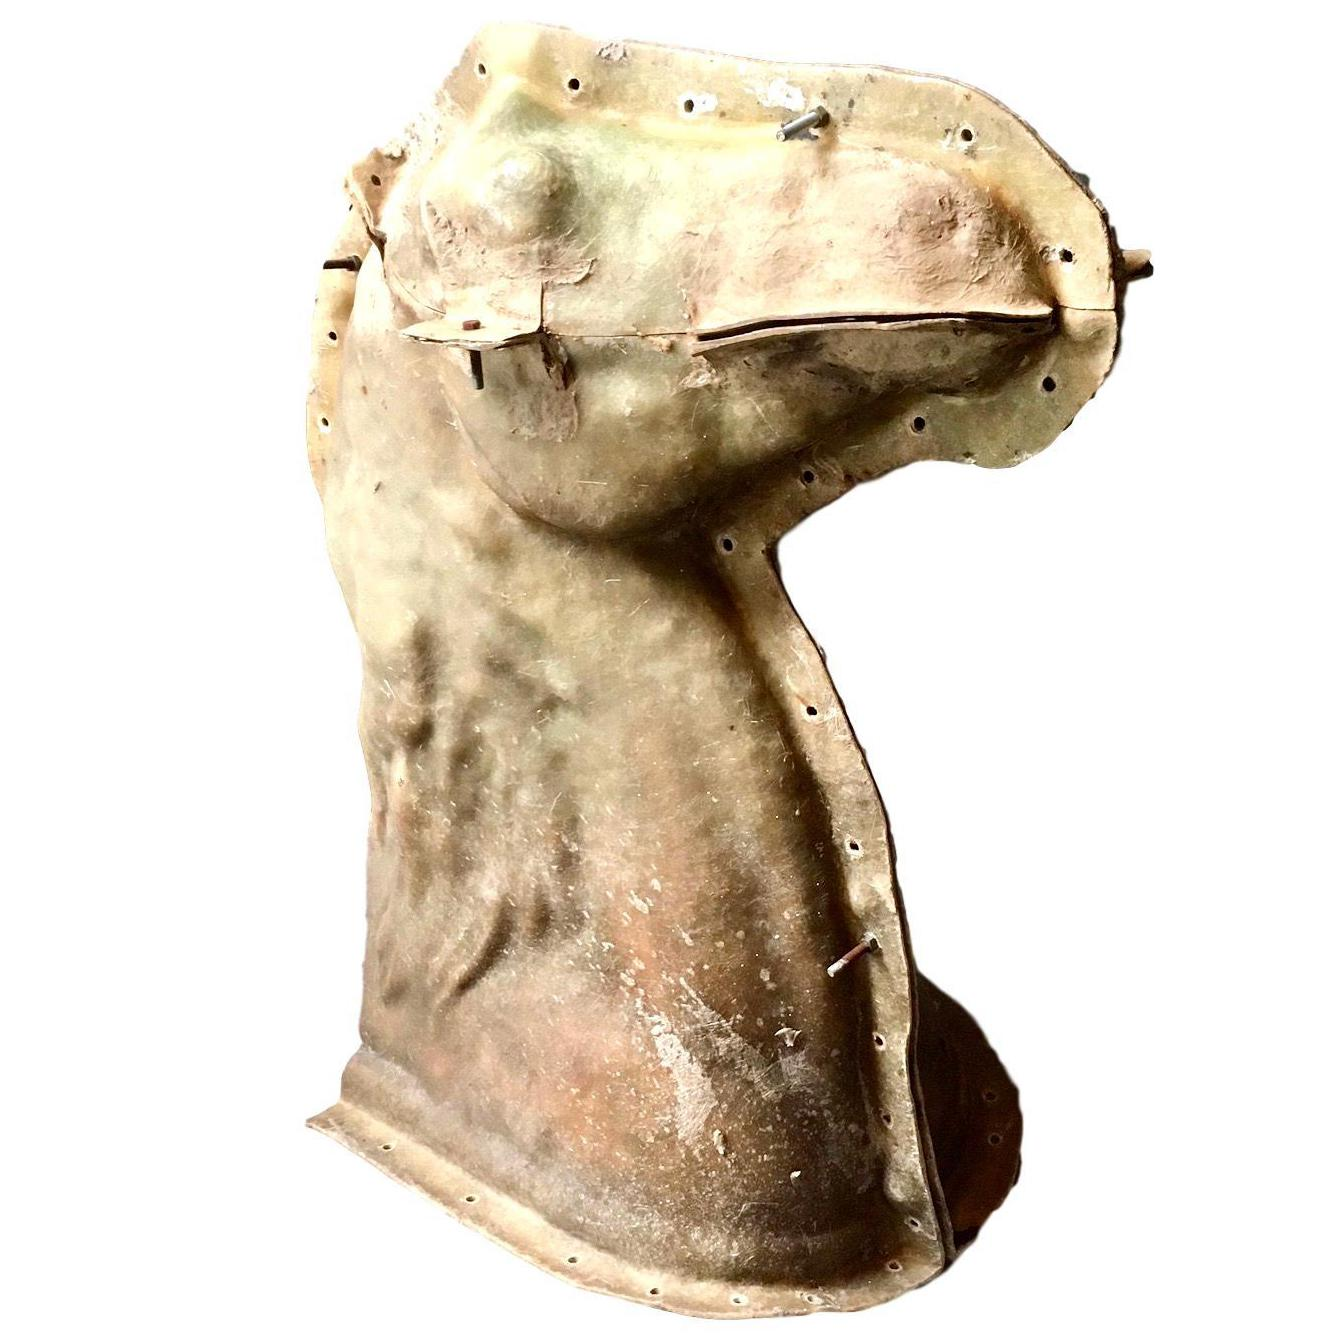 Lifesize Fiberglass Horse Head Mold